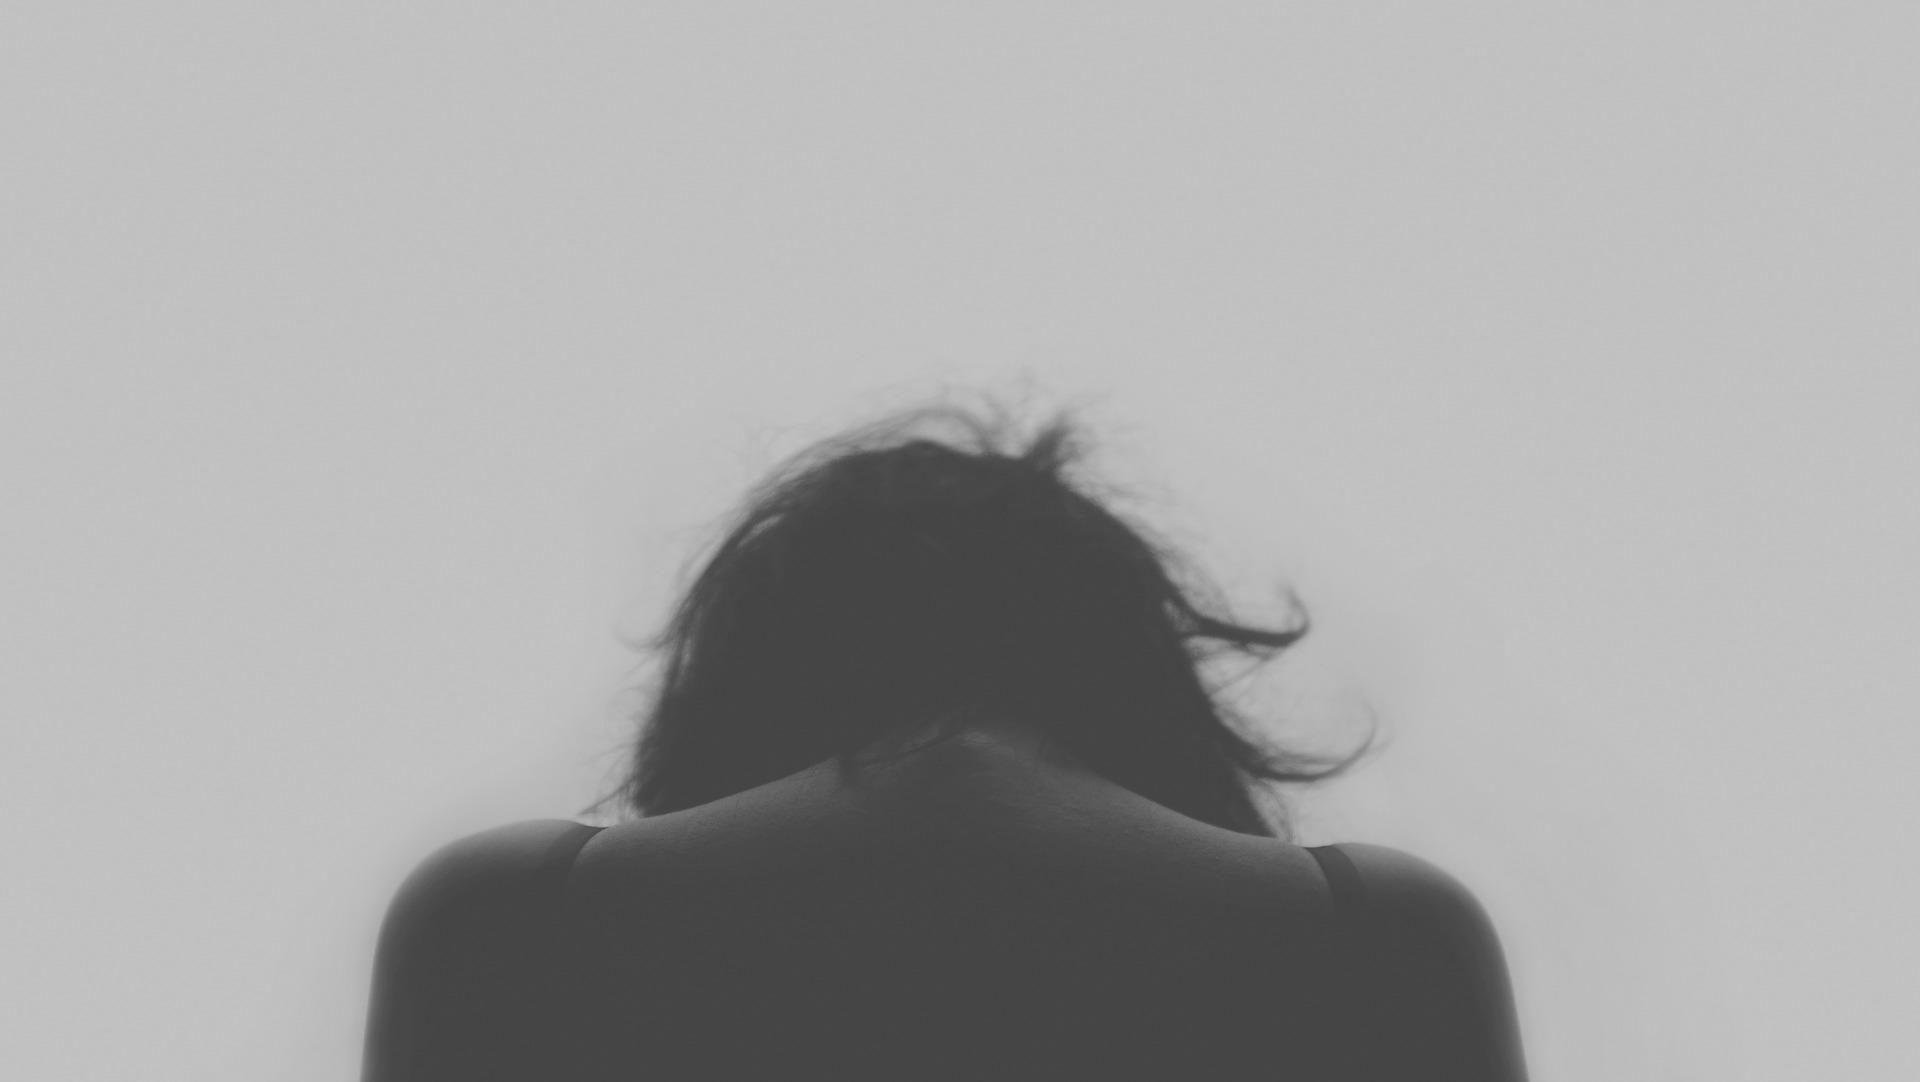 Overcoming Mental Health Demons